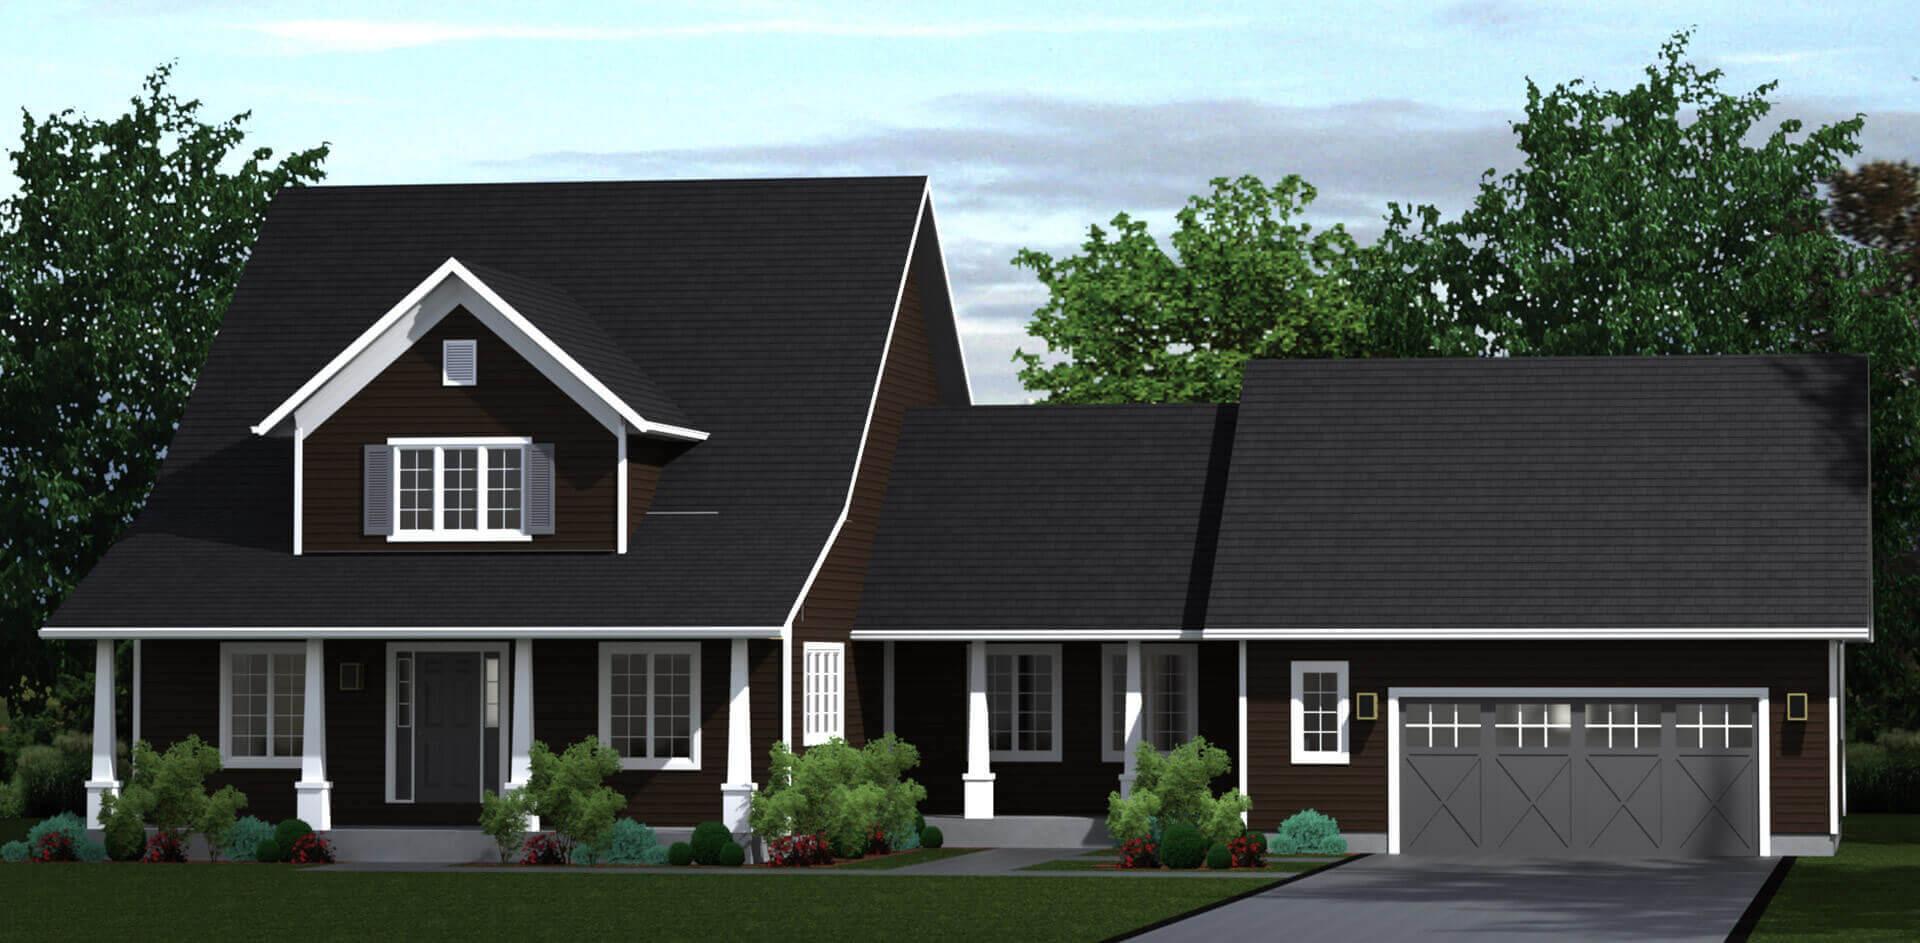 2586 house exterior